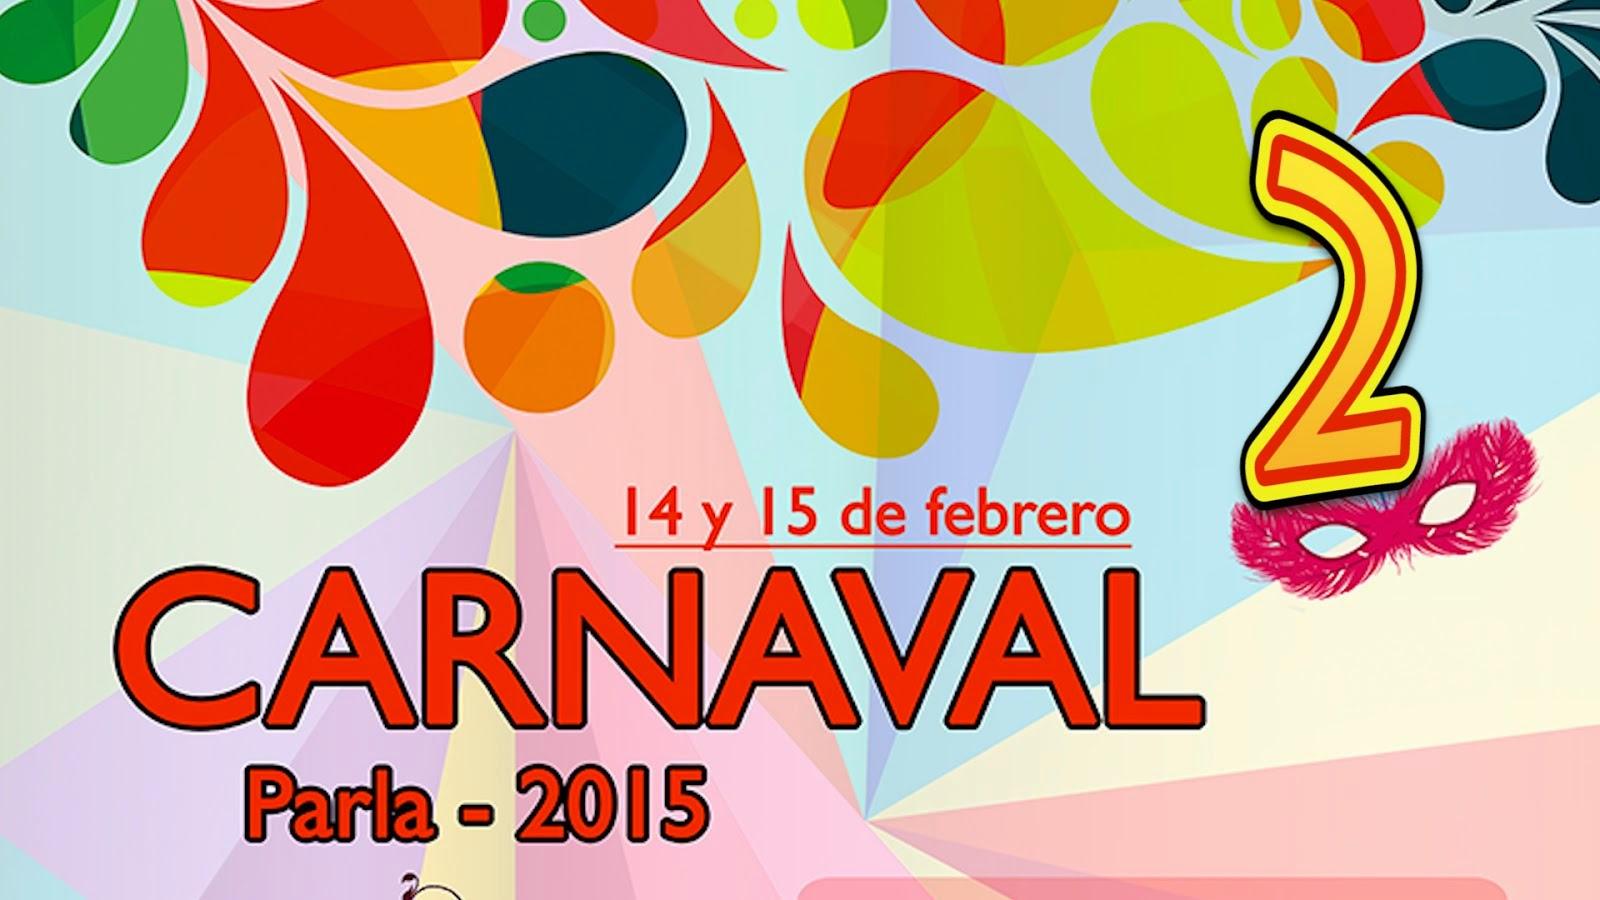 CARNAVAL 2015 de PARLA